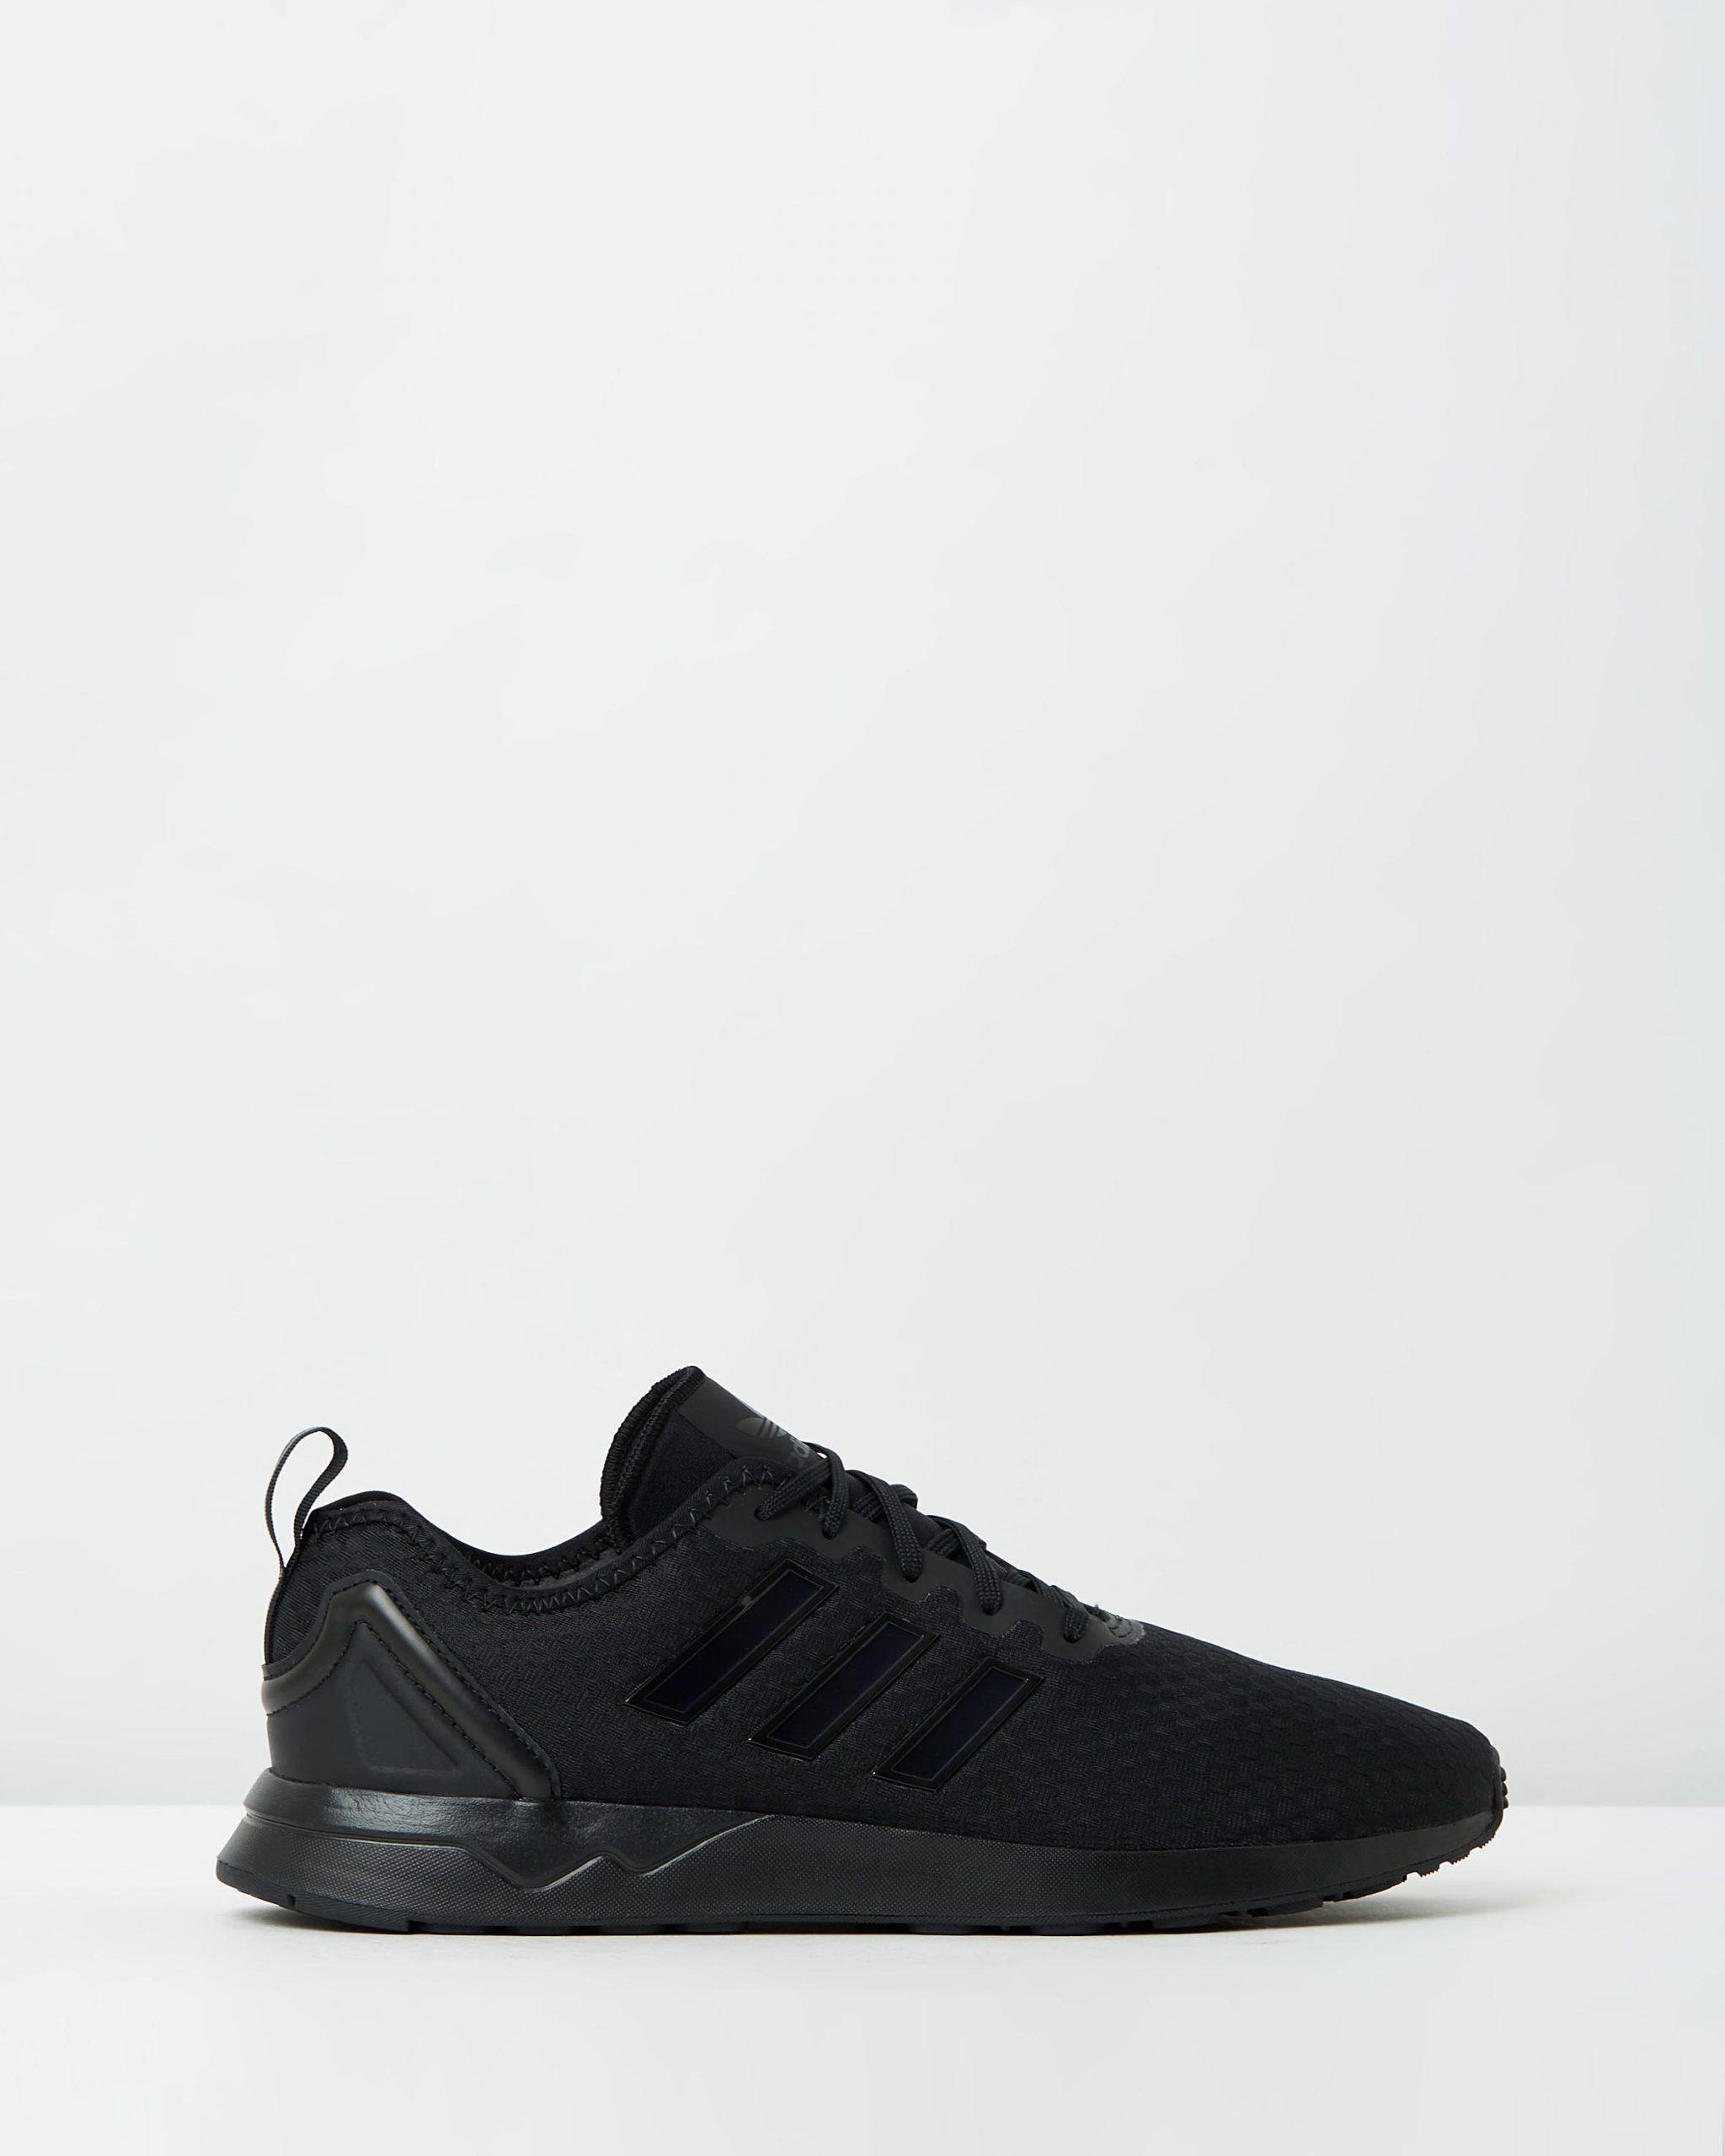 Adidas Men's ZX Flux ADV Black